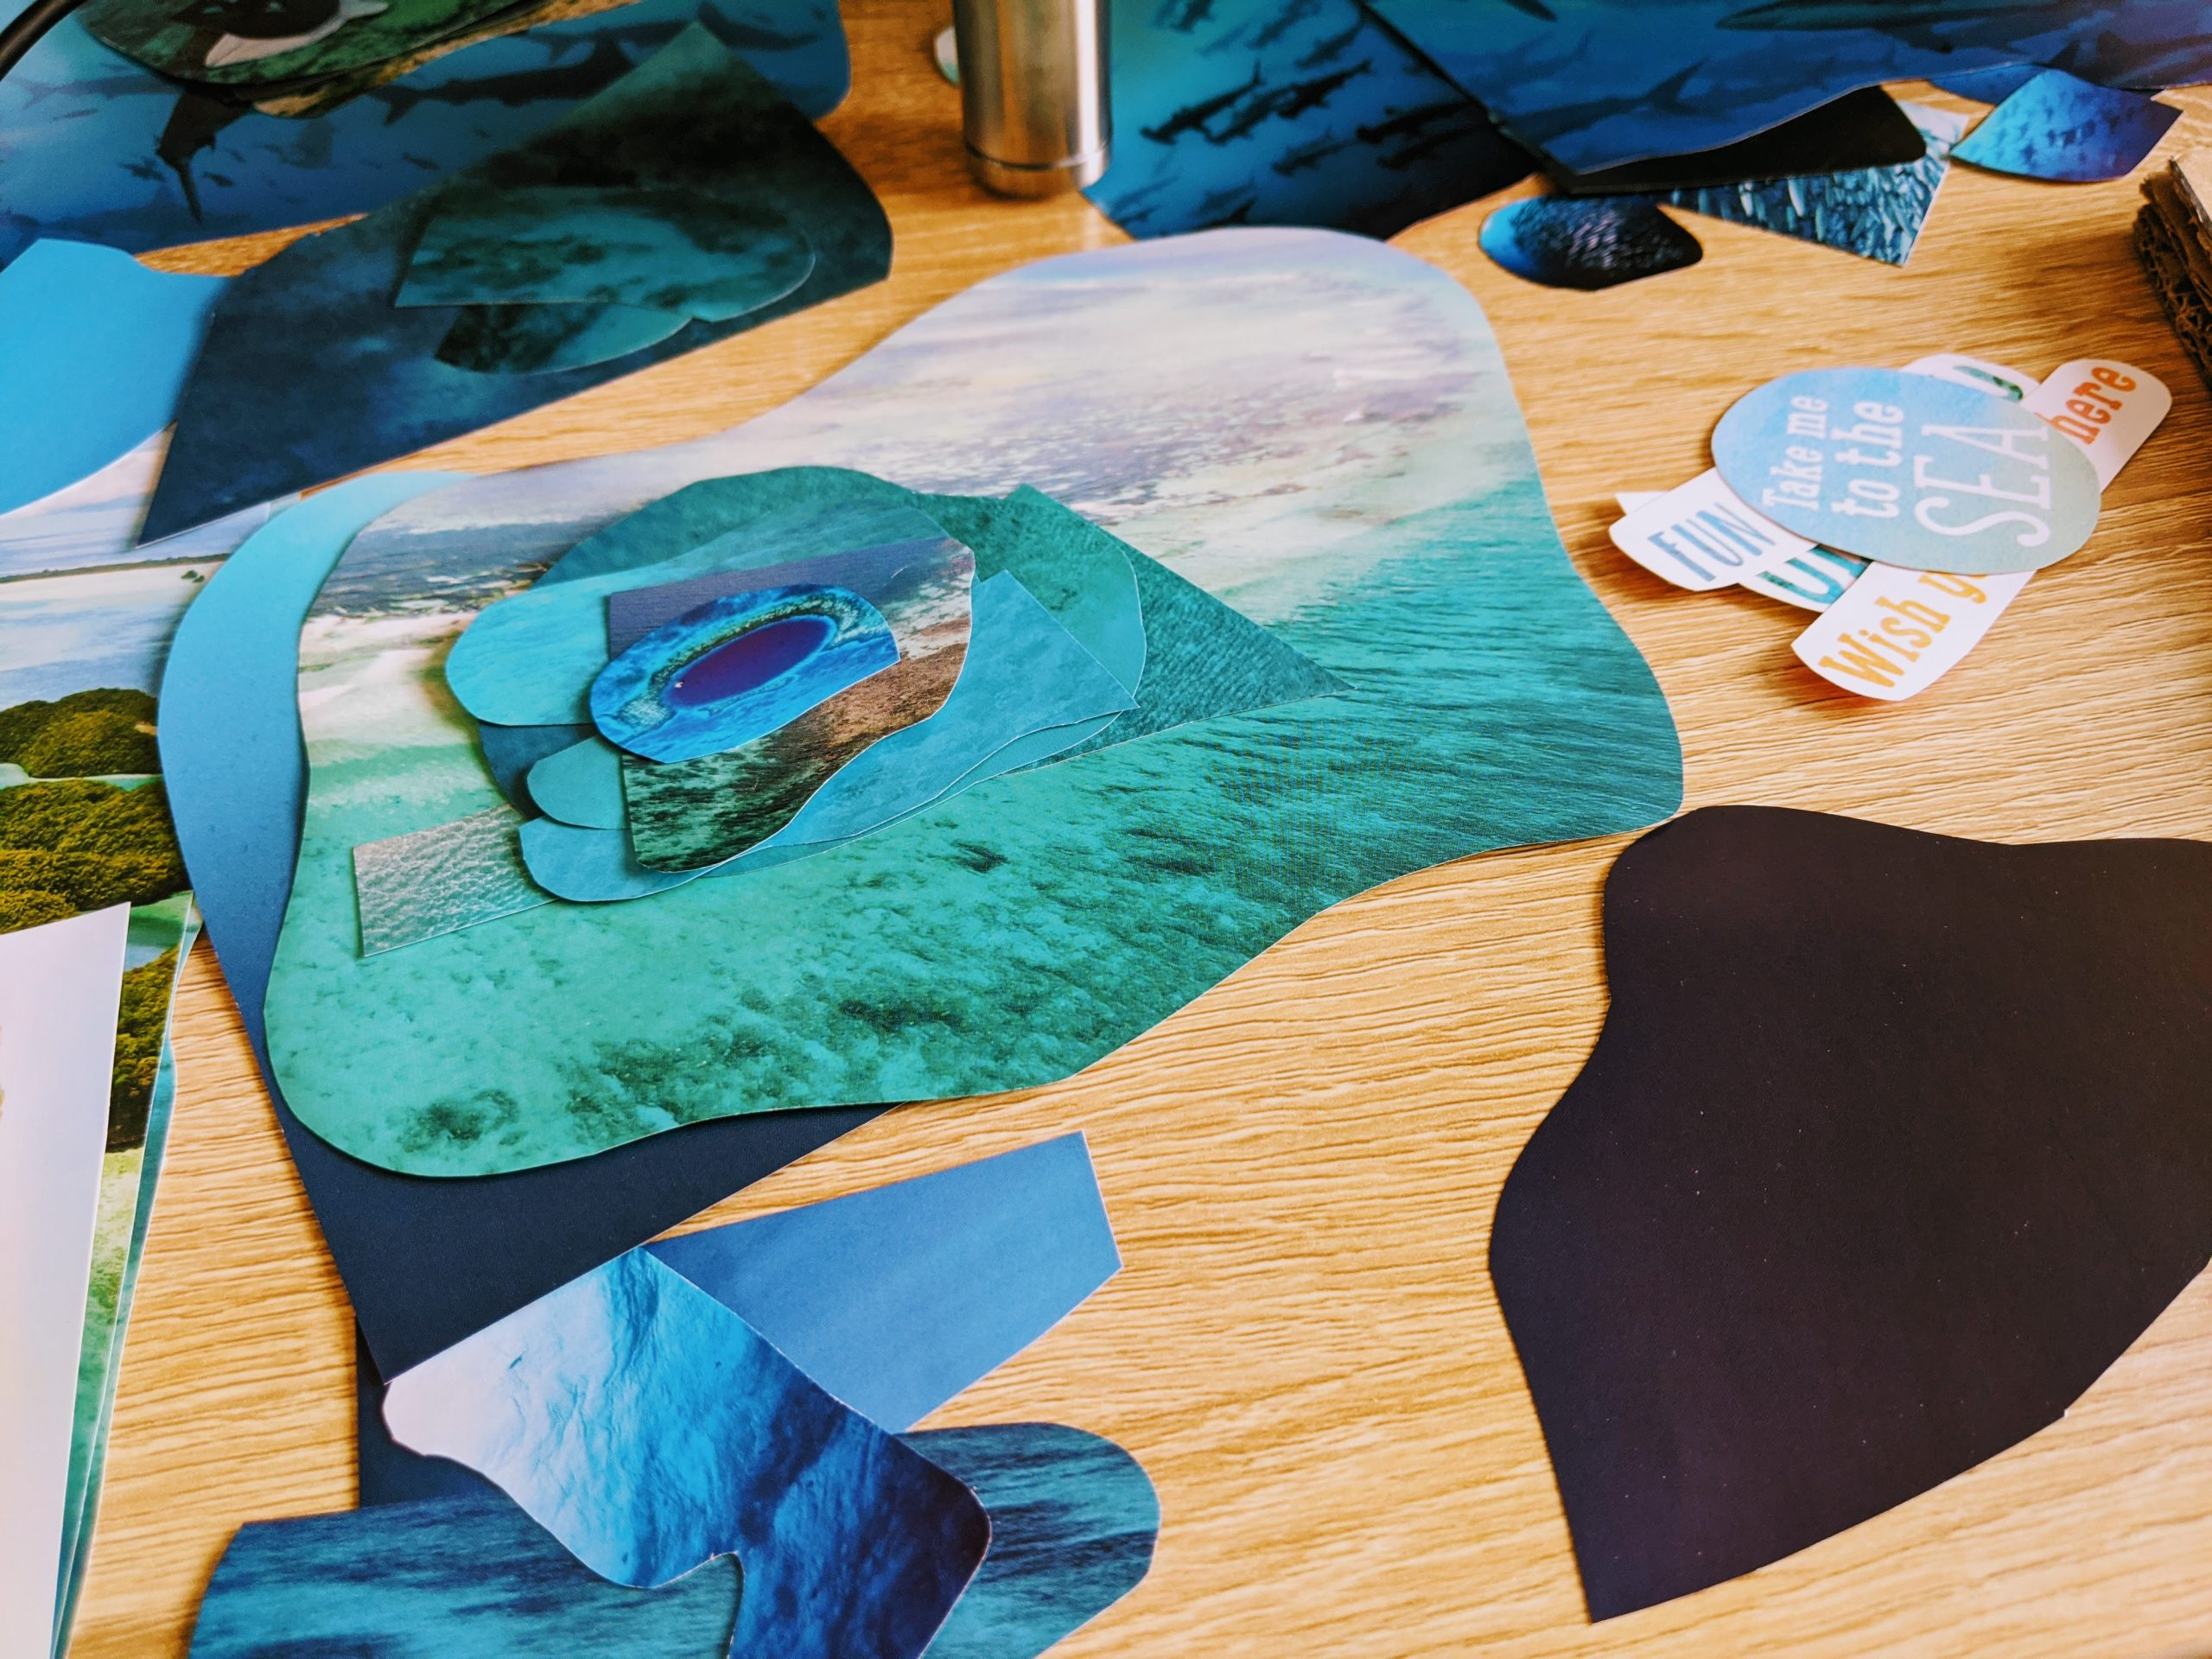 Magazine cutouts - ocean themed